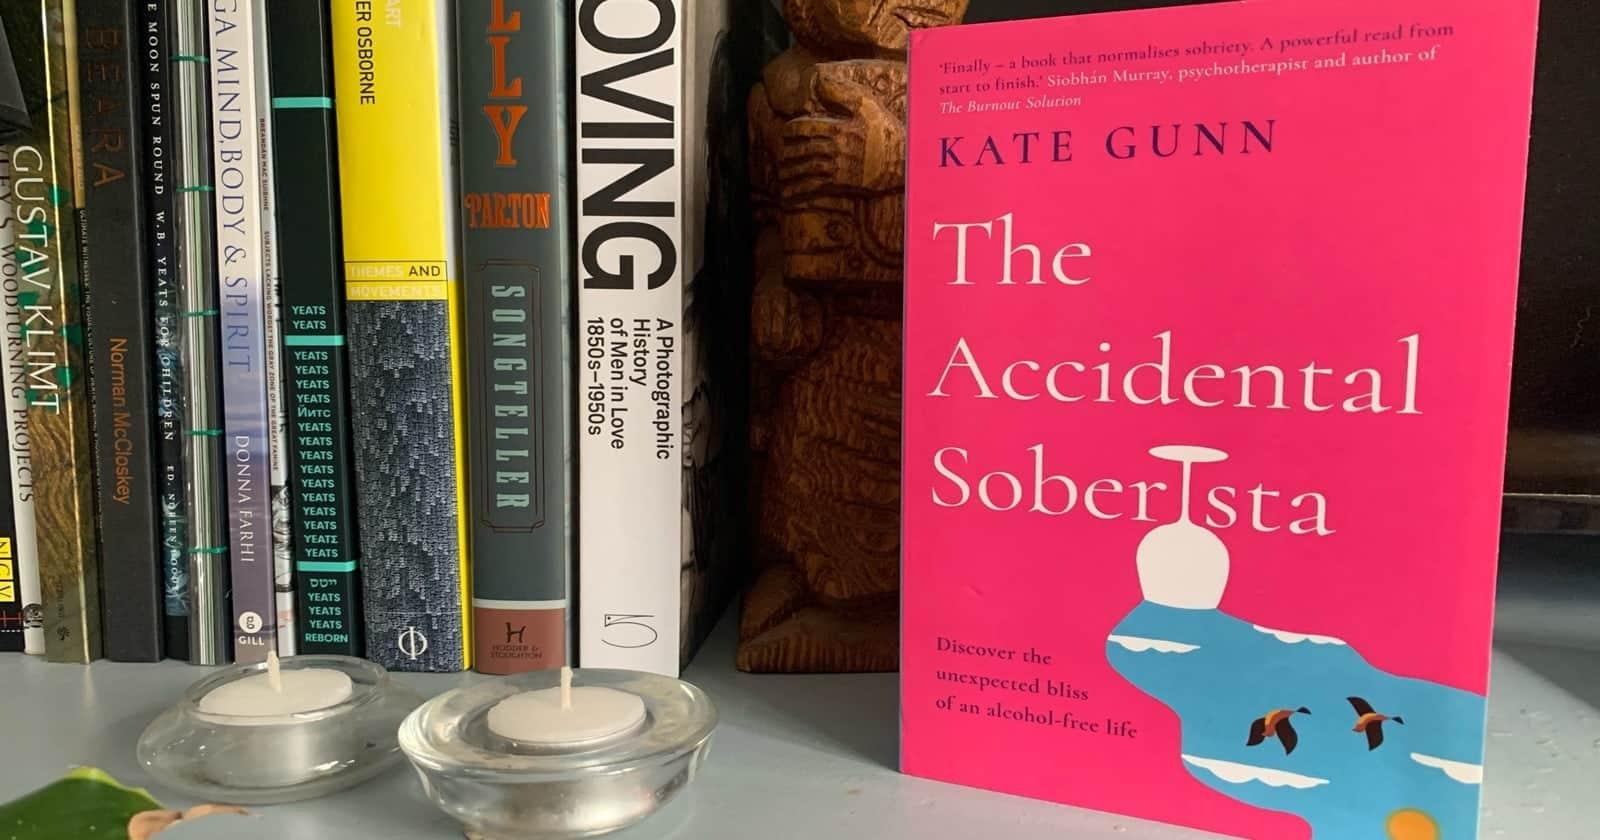 The Accidental Soberista on a bookshelf